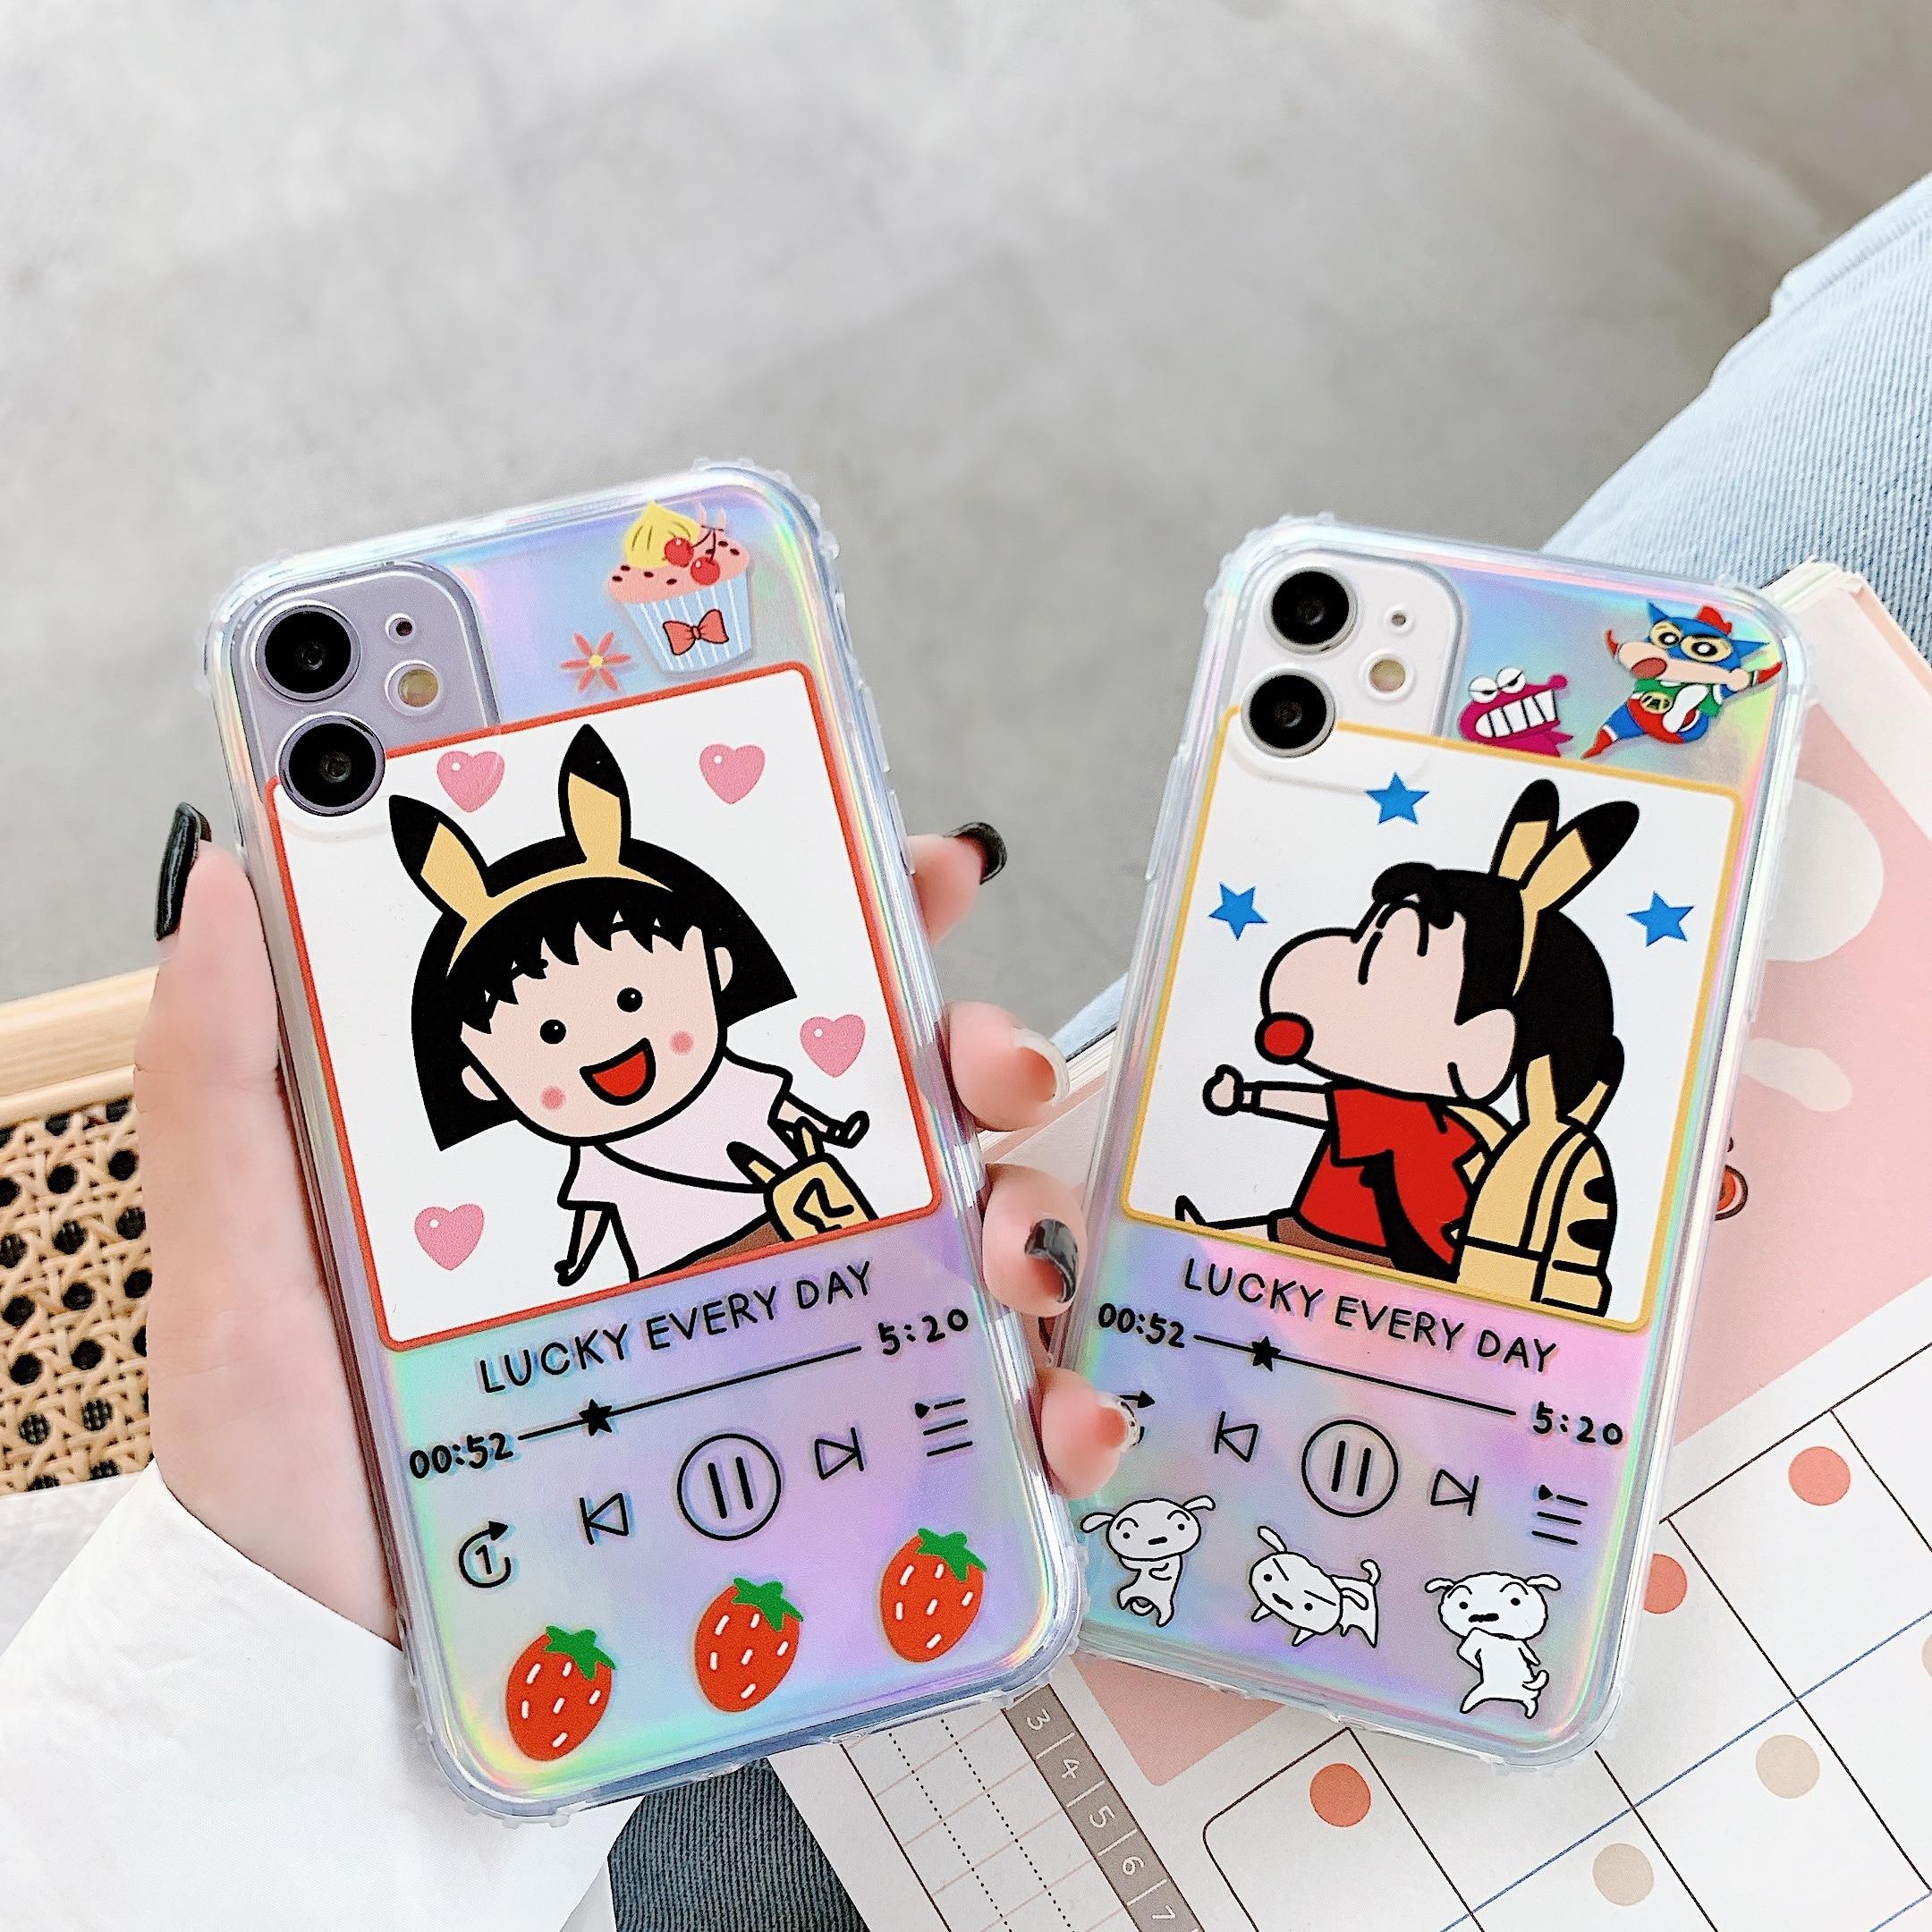 Cartoon Cute Japan Anime Crayon Shinchan Ultraman Phone Case For iPhone 11 Pro X XS Max XR 8 7 Plus Soft Laser Paper Cover Funda